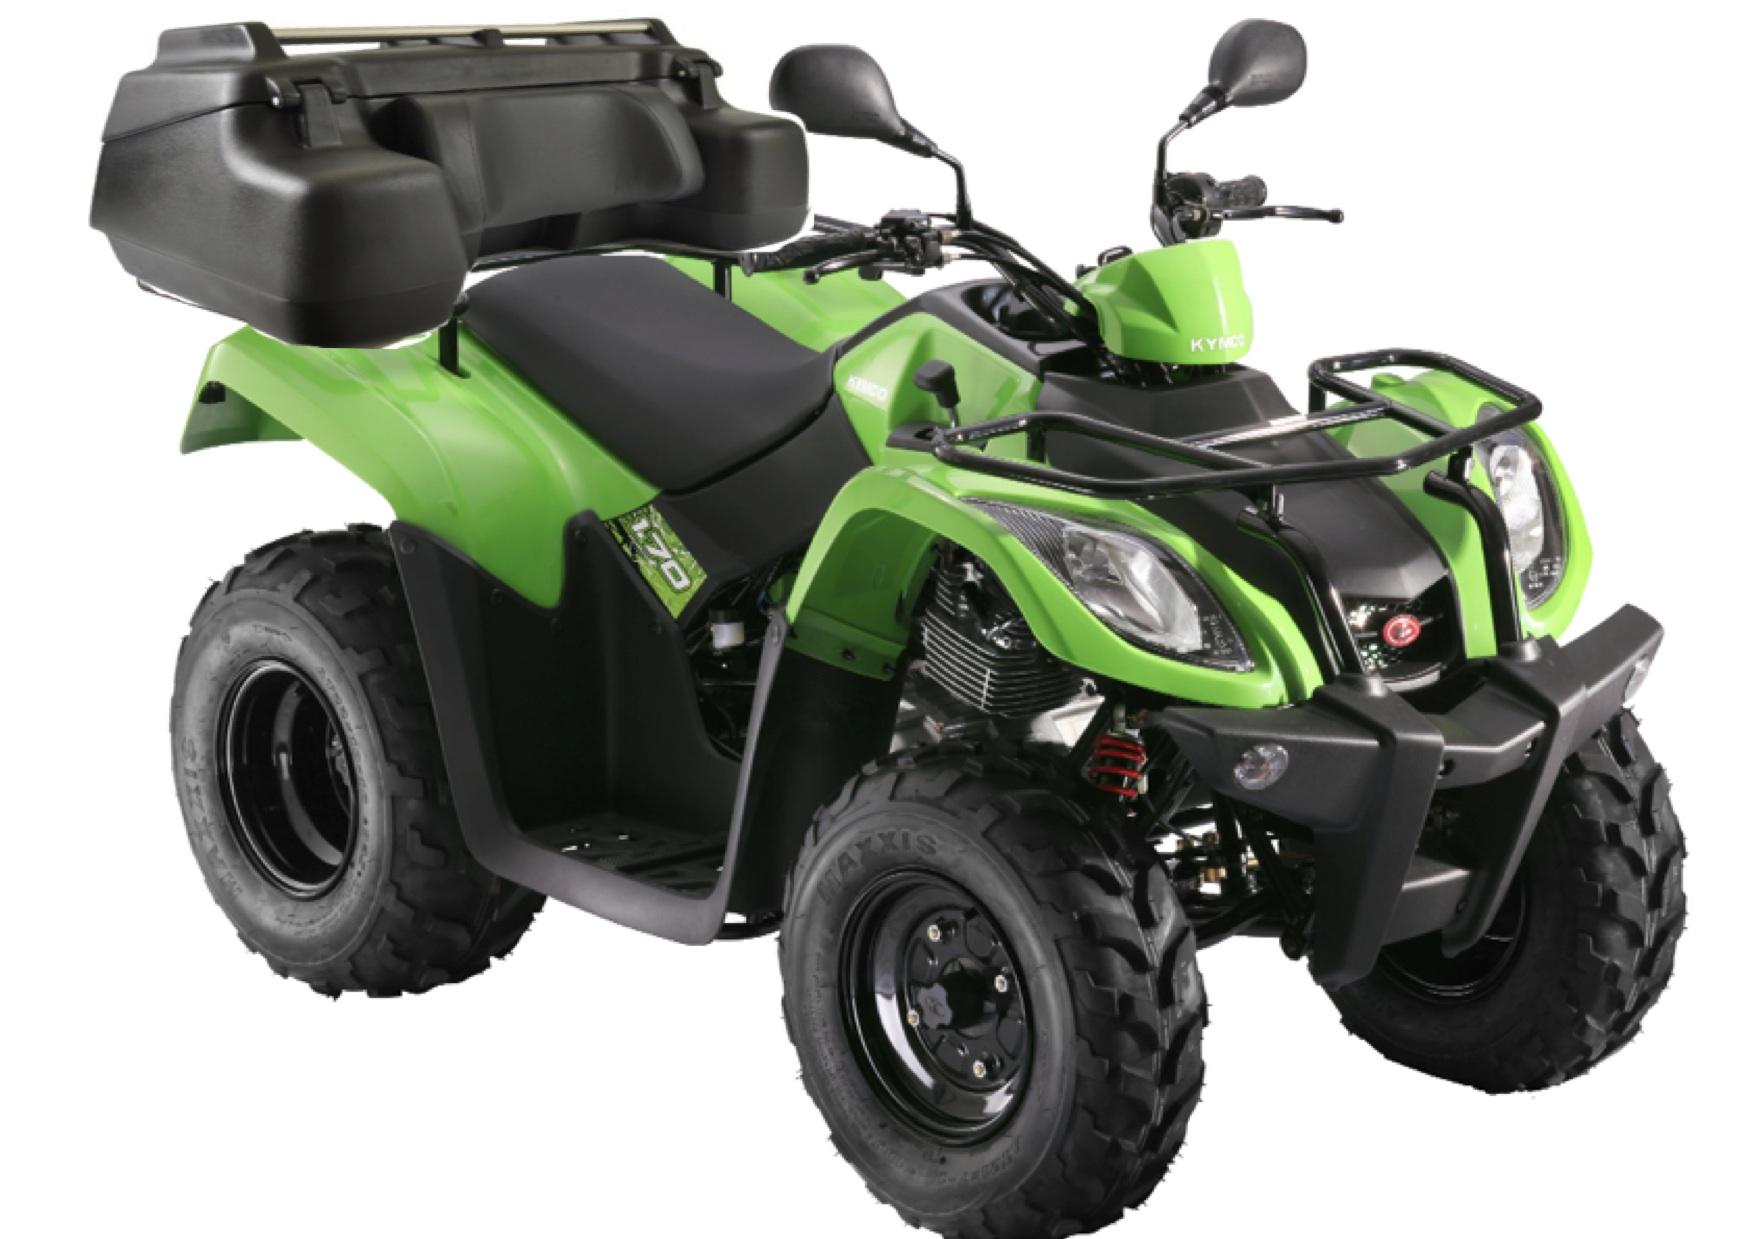 KYMCO QUAD 170 cc 4 wheel